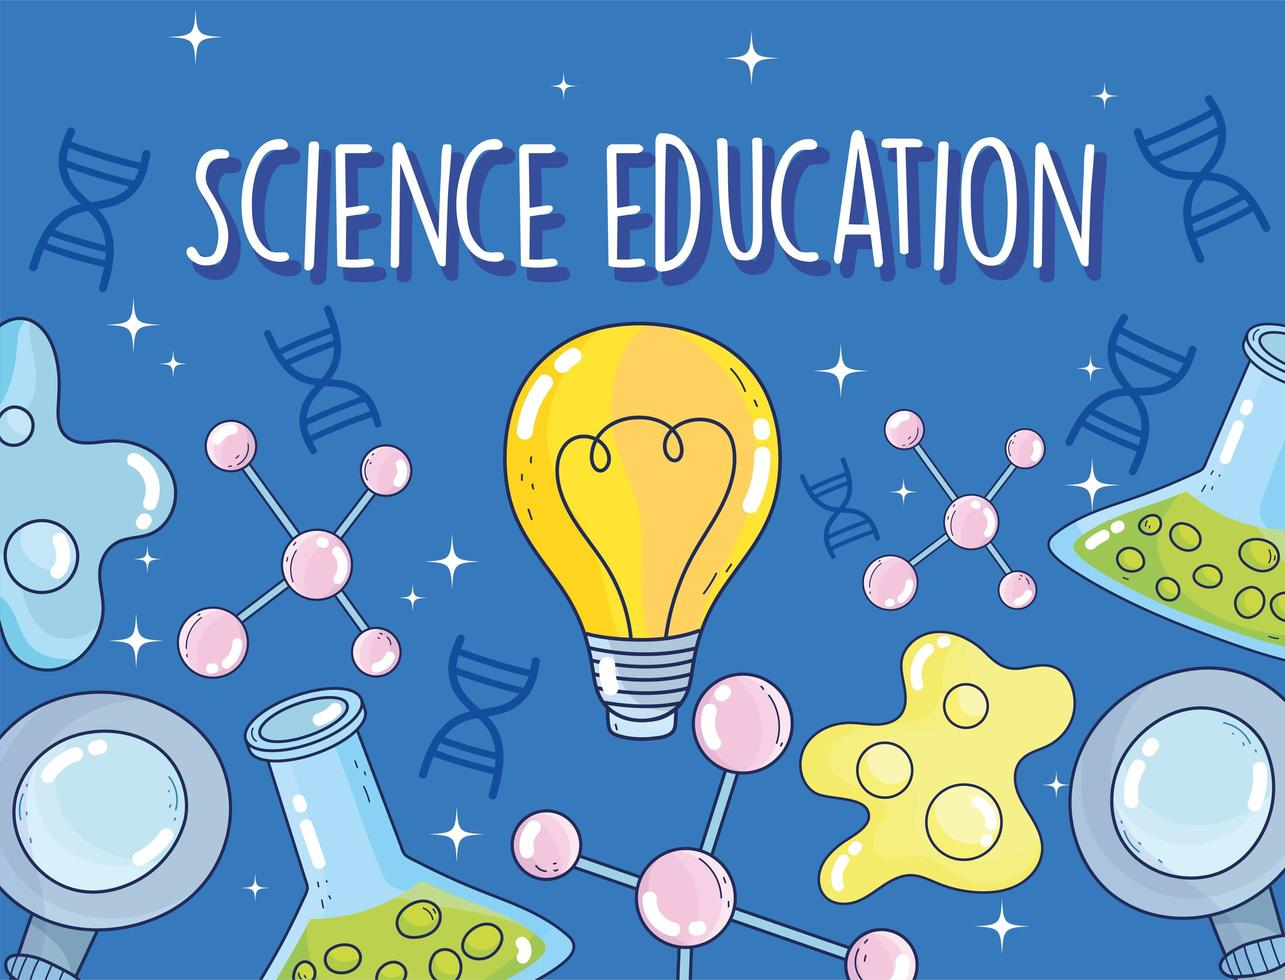 Wissenschaftsausbildung Reagenzglas Chemie Bakterien Atom Lupe Forschungslabor vektor